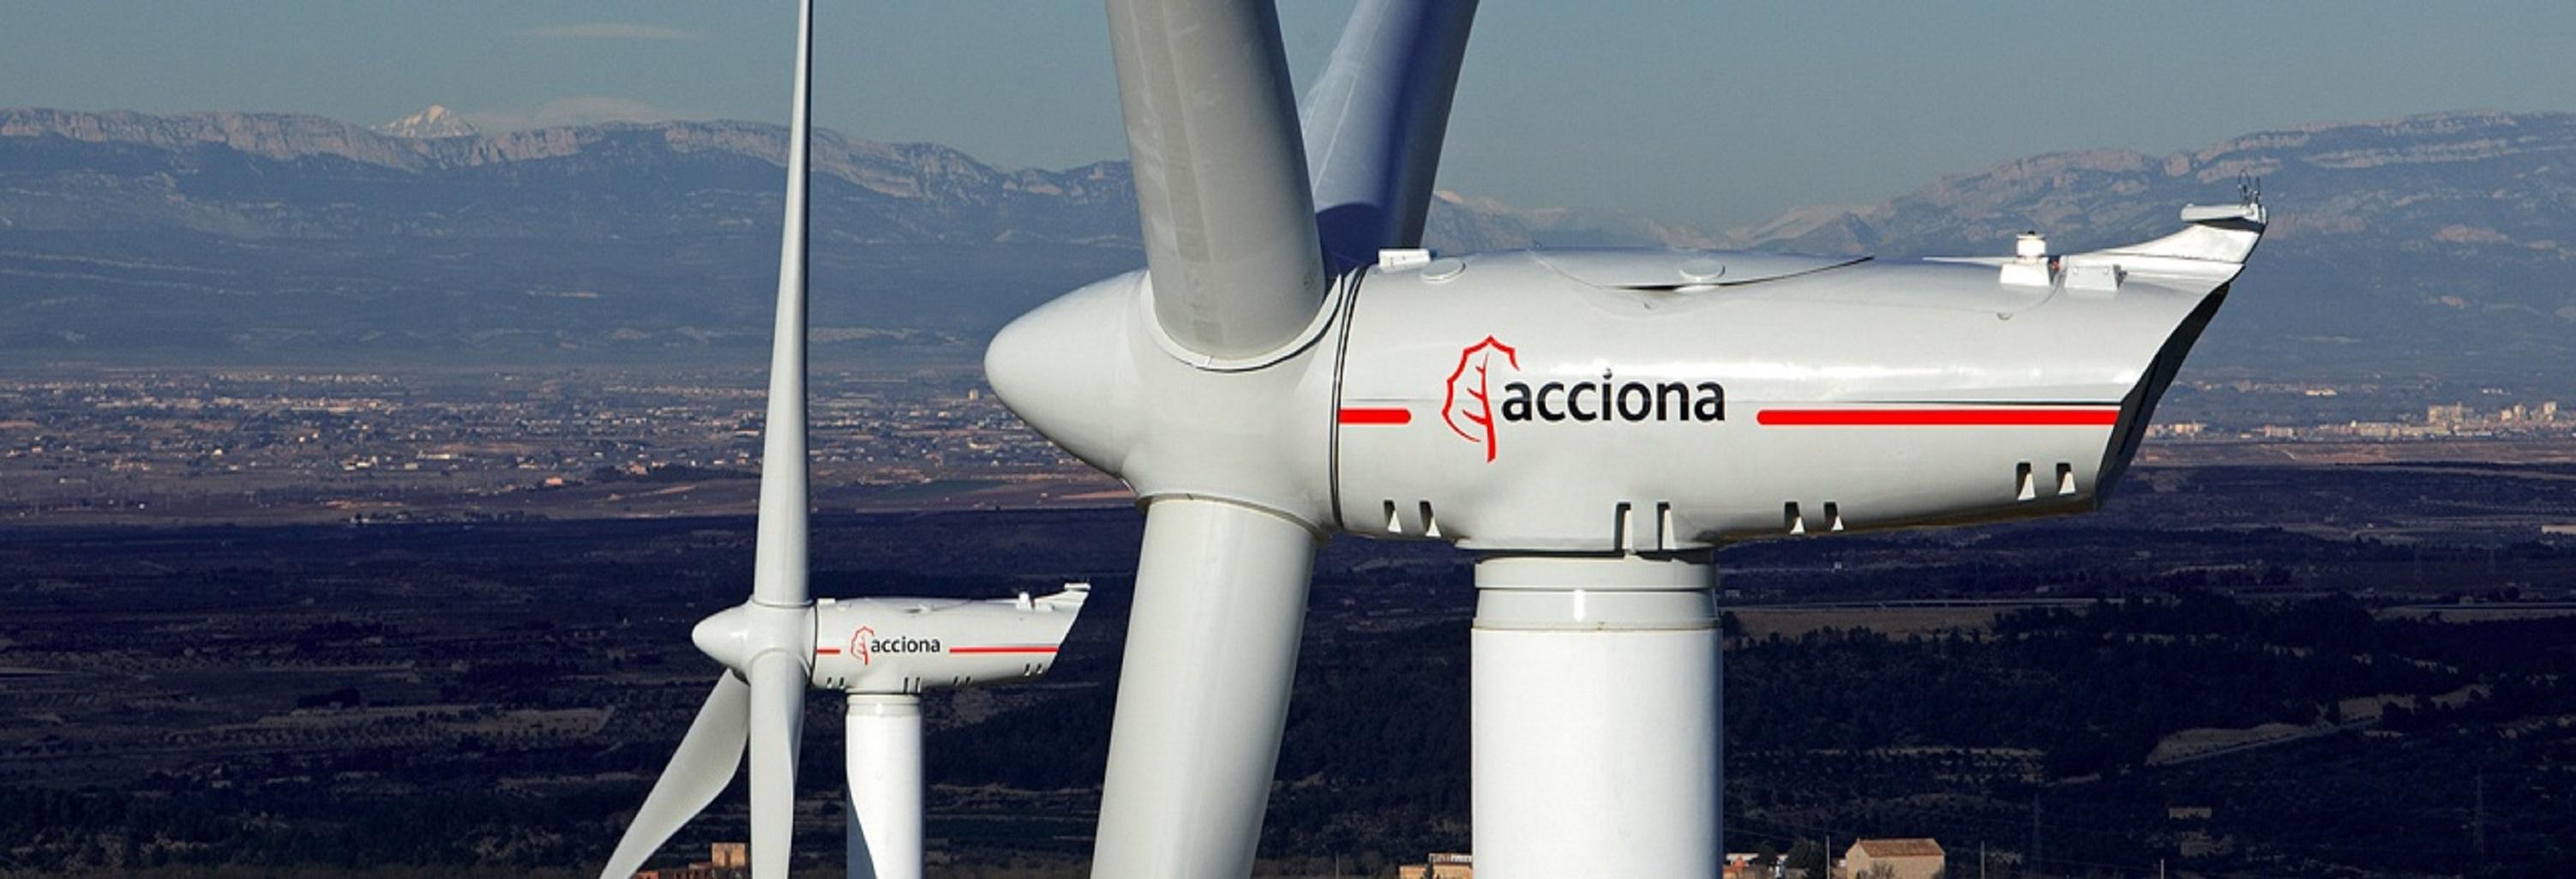 Acciona Wind Power